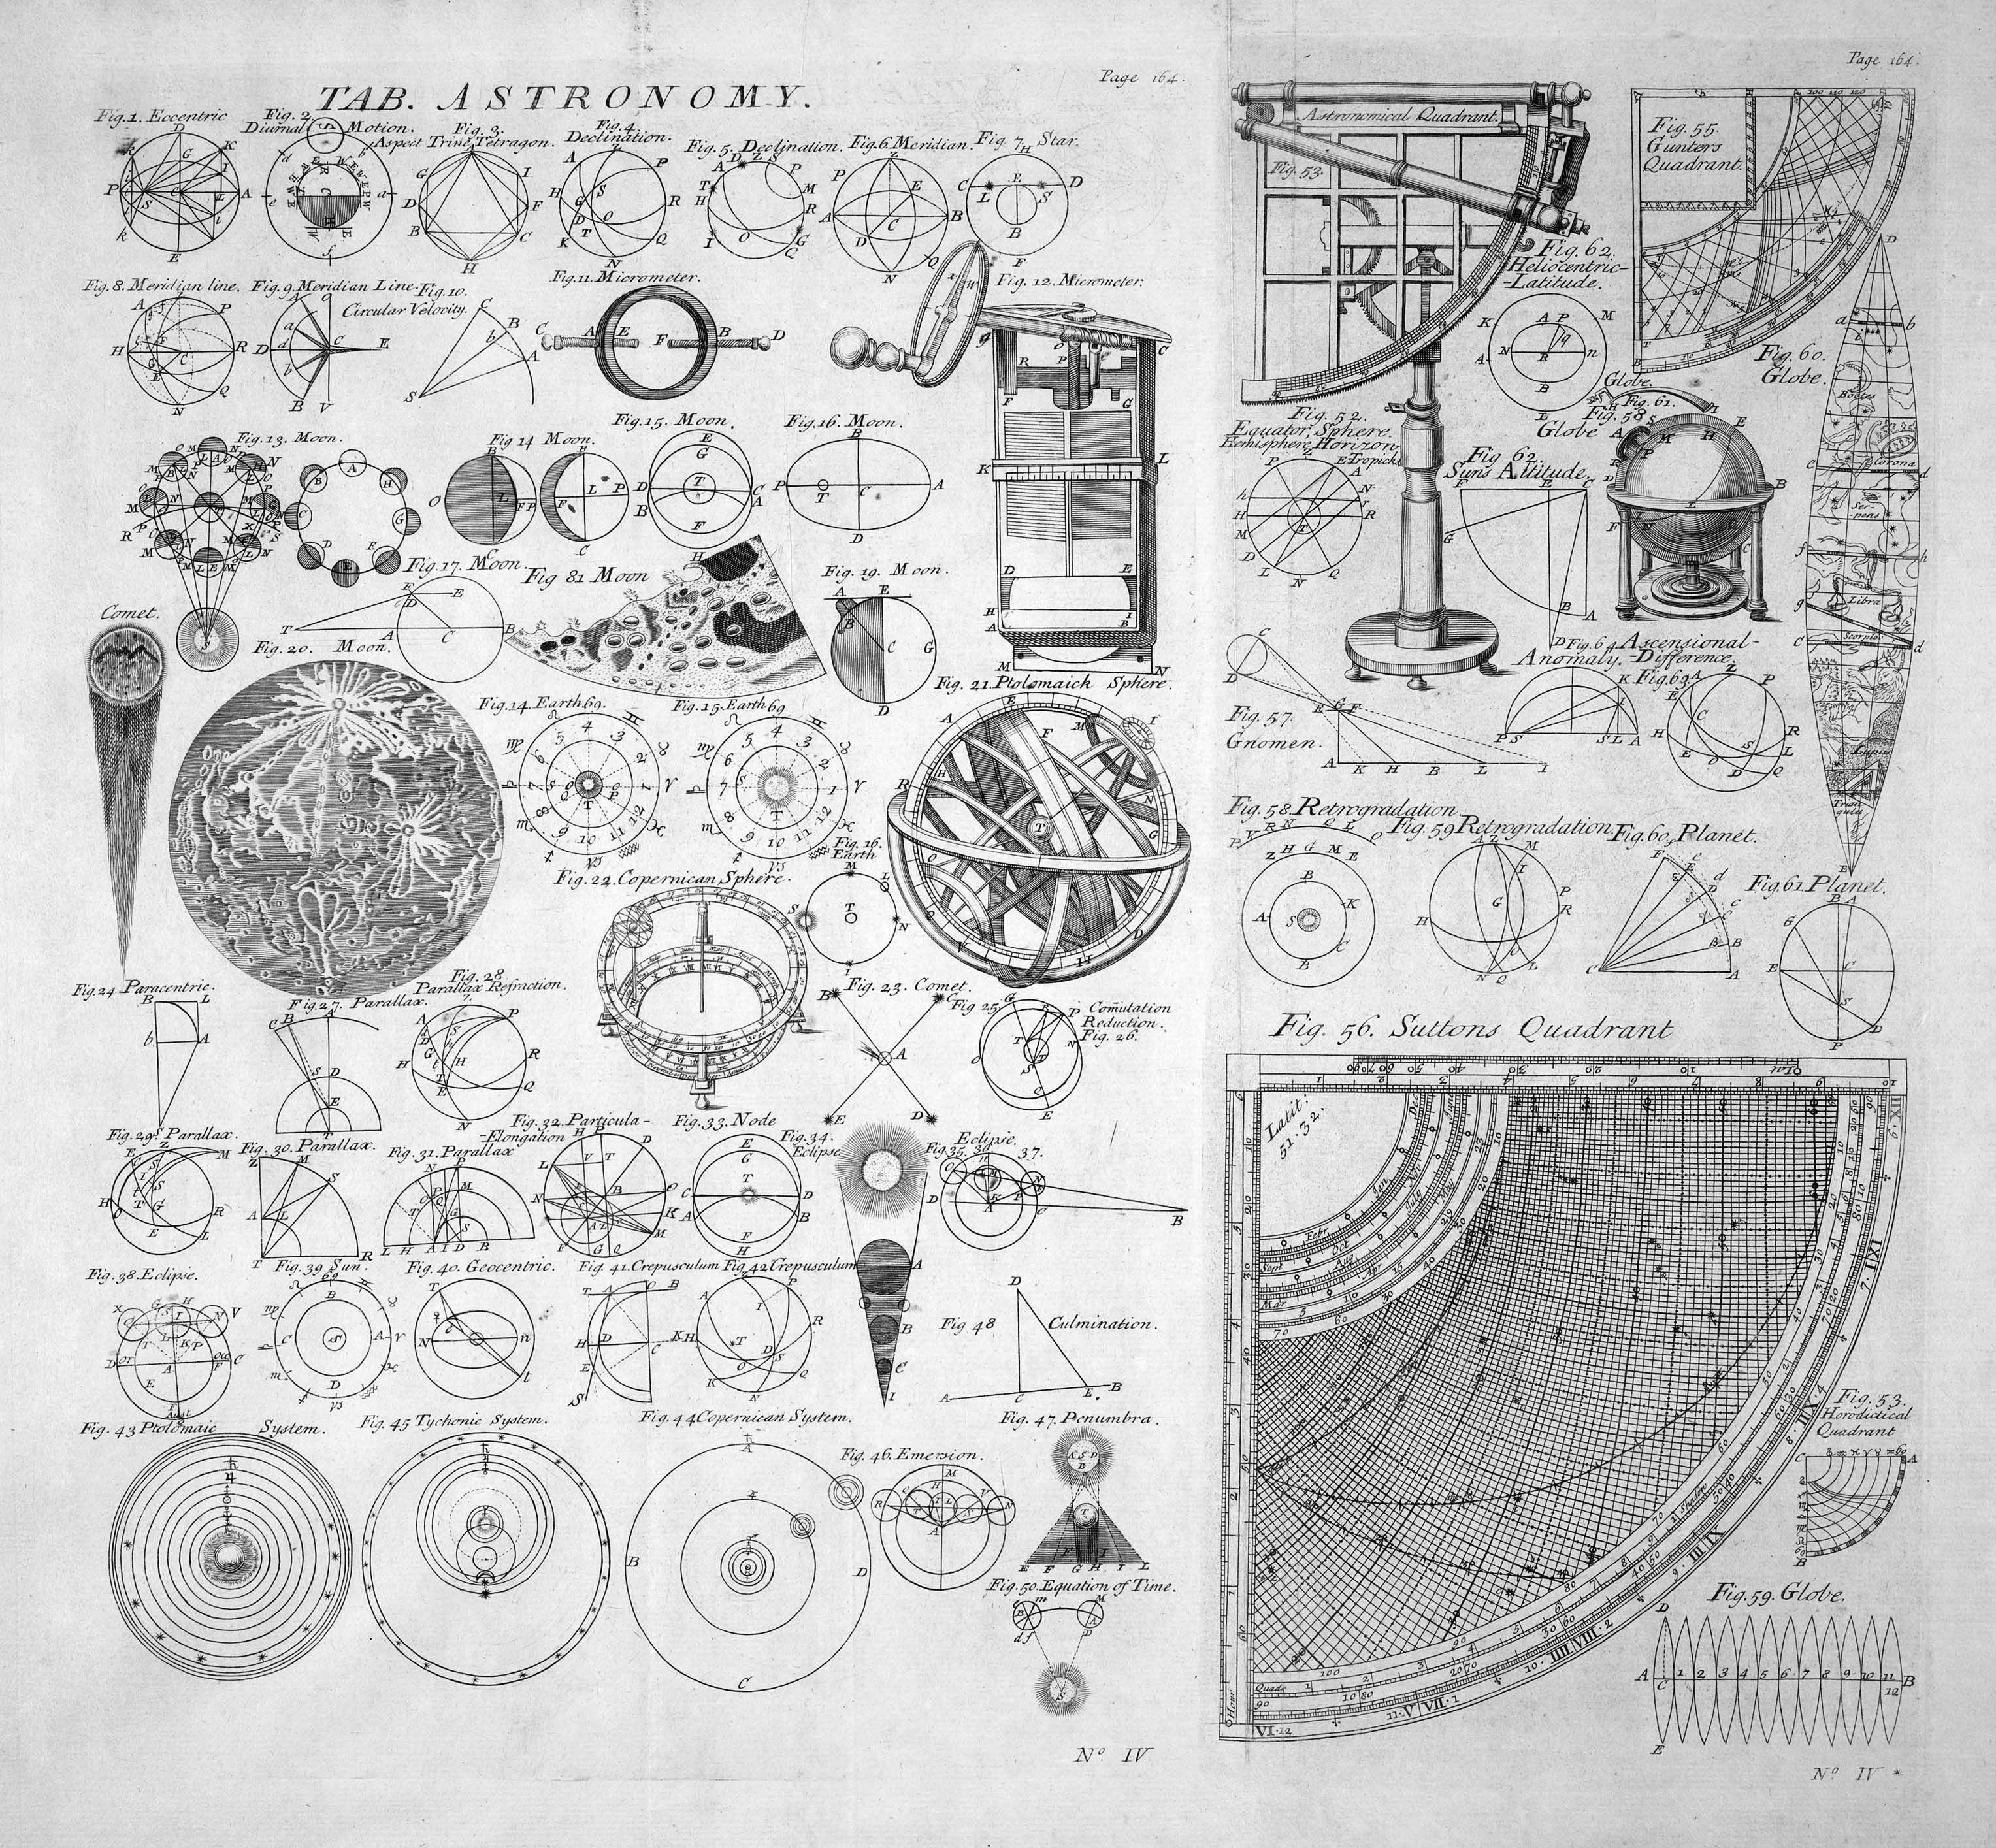 Table_of_Astronomy,_Cyclopaedia,_Volume_1,_p_164